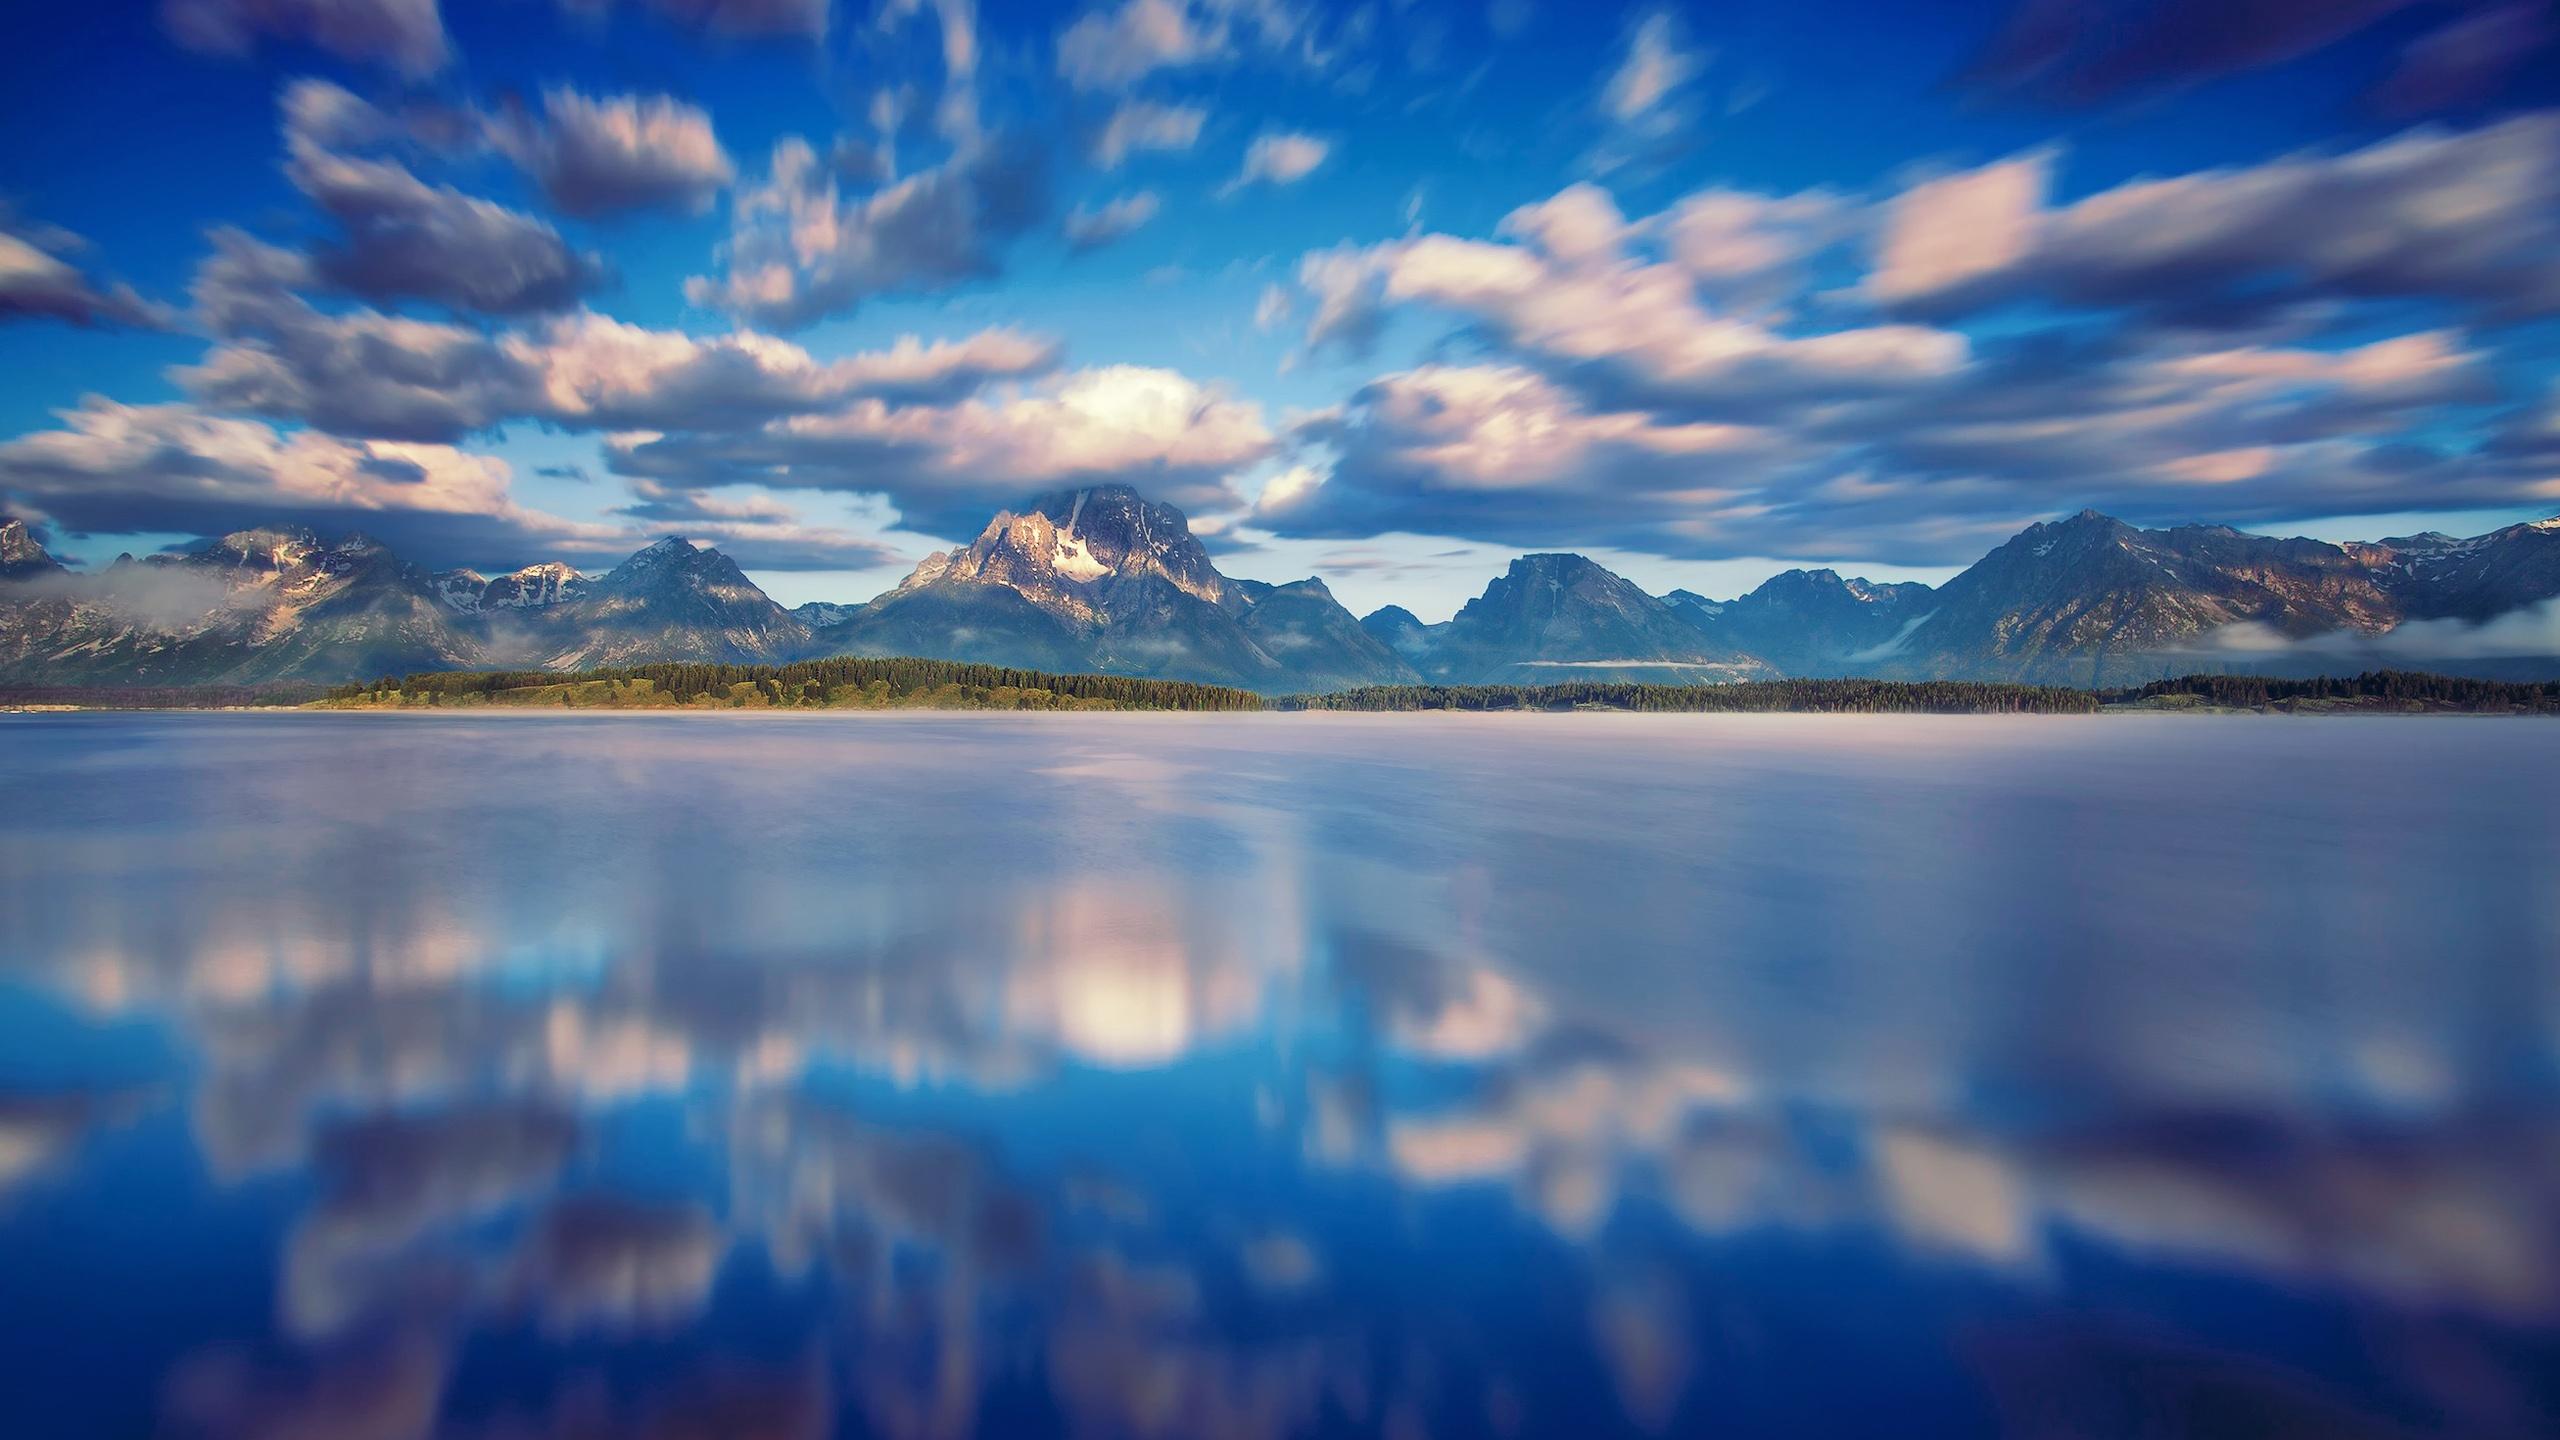 wallpaper 2560x1440 water mountains - photo #18